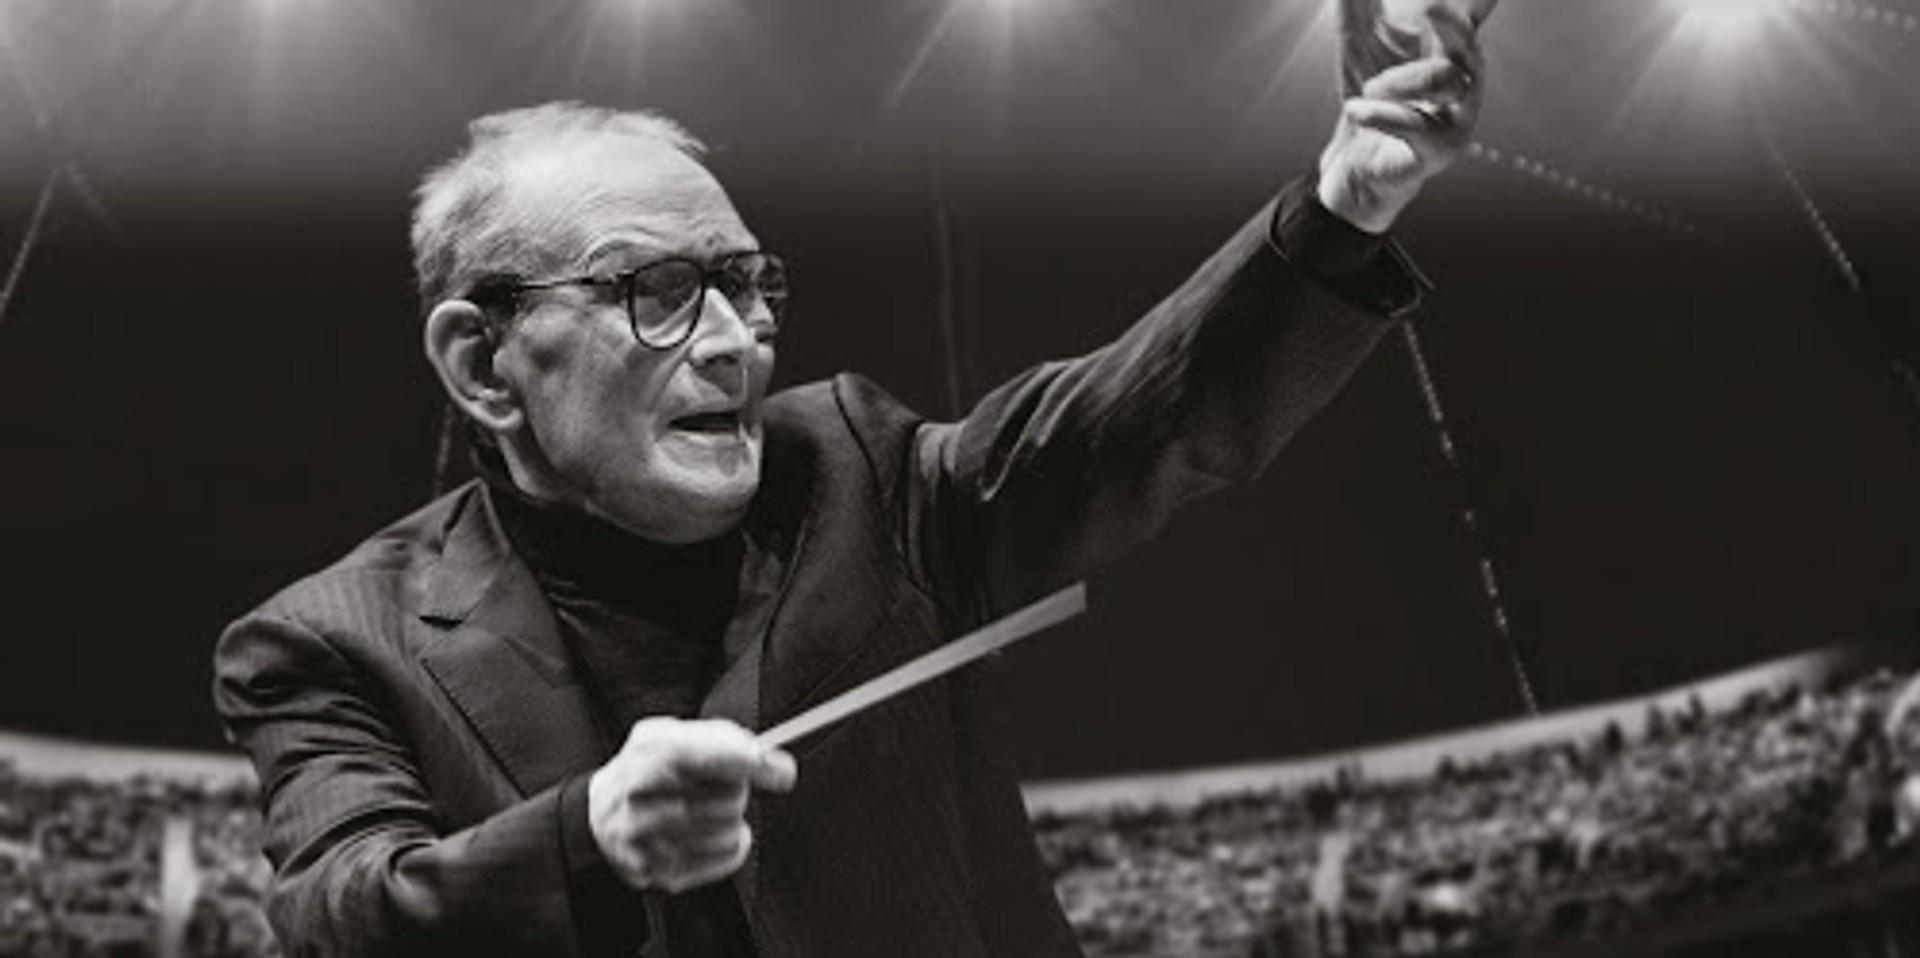 'Cinema Paradiso' film composer Ennio Morricone dies at age 91